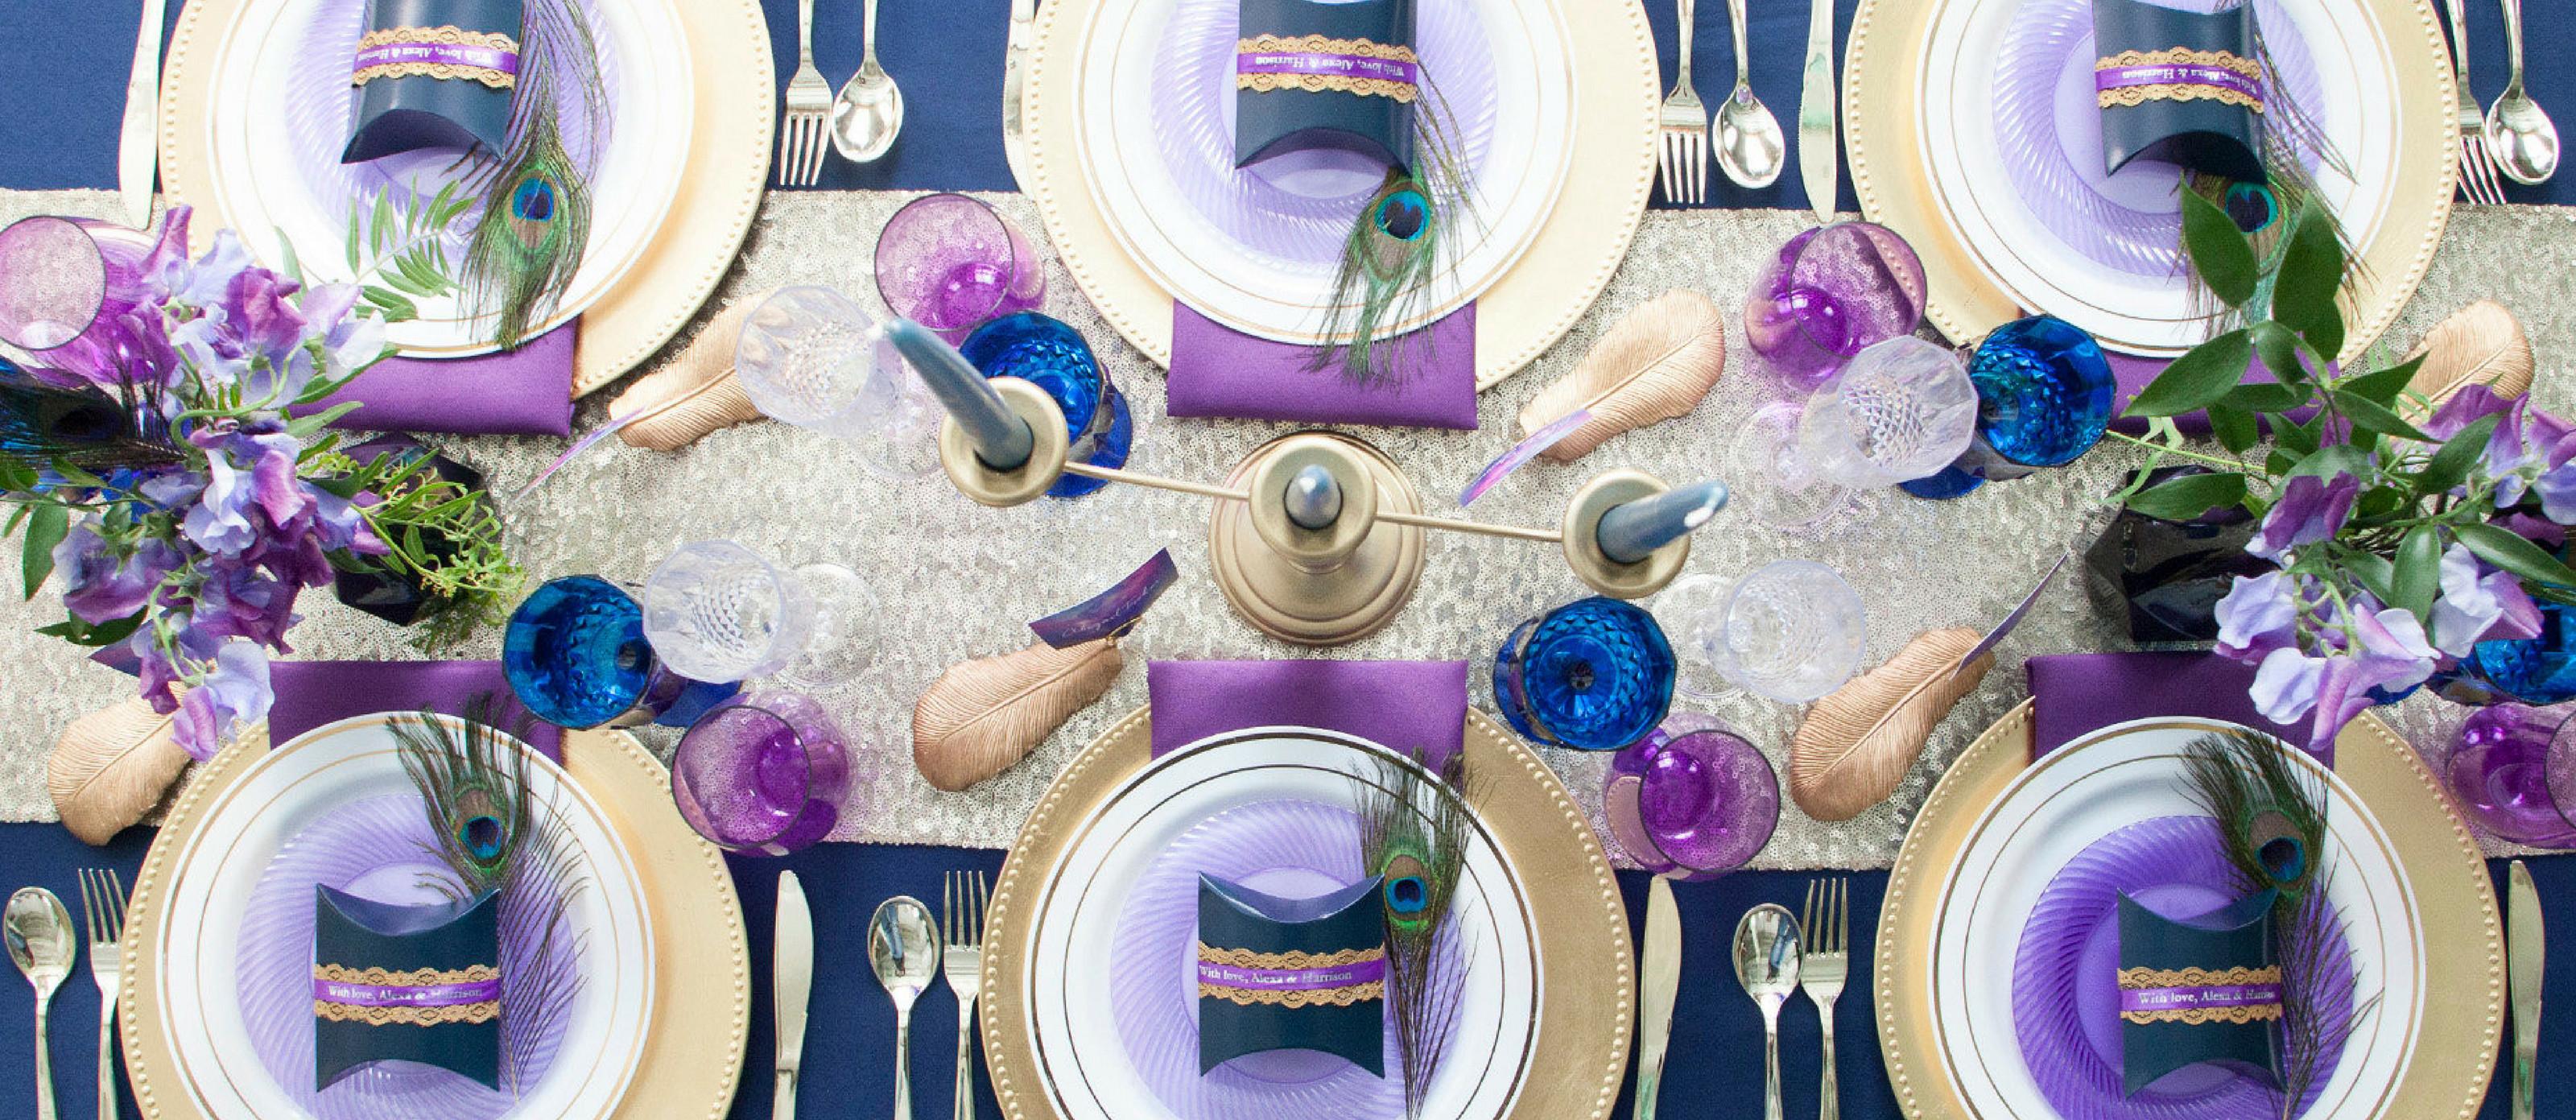 purple cut glass vase of elegant navy and purple wedding table ideas with elegant navy and purple wedding table ideas hero 0